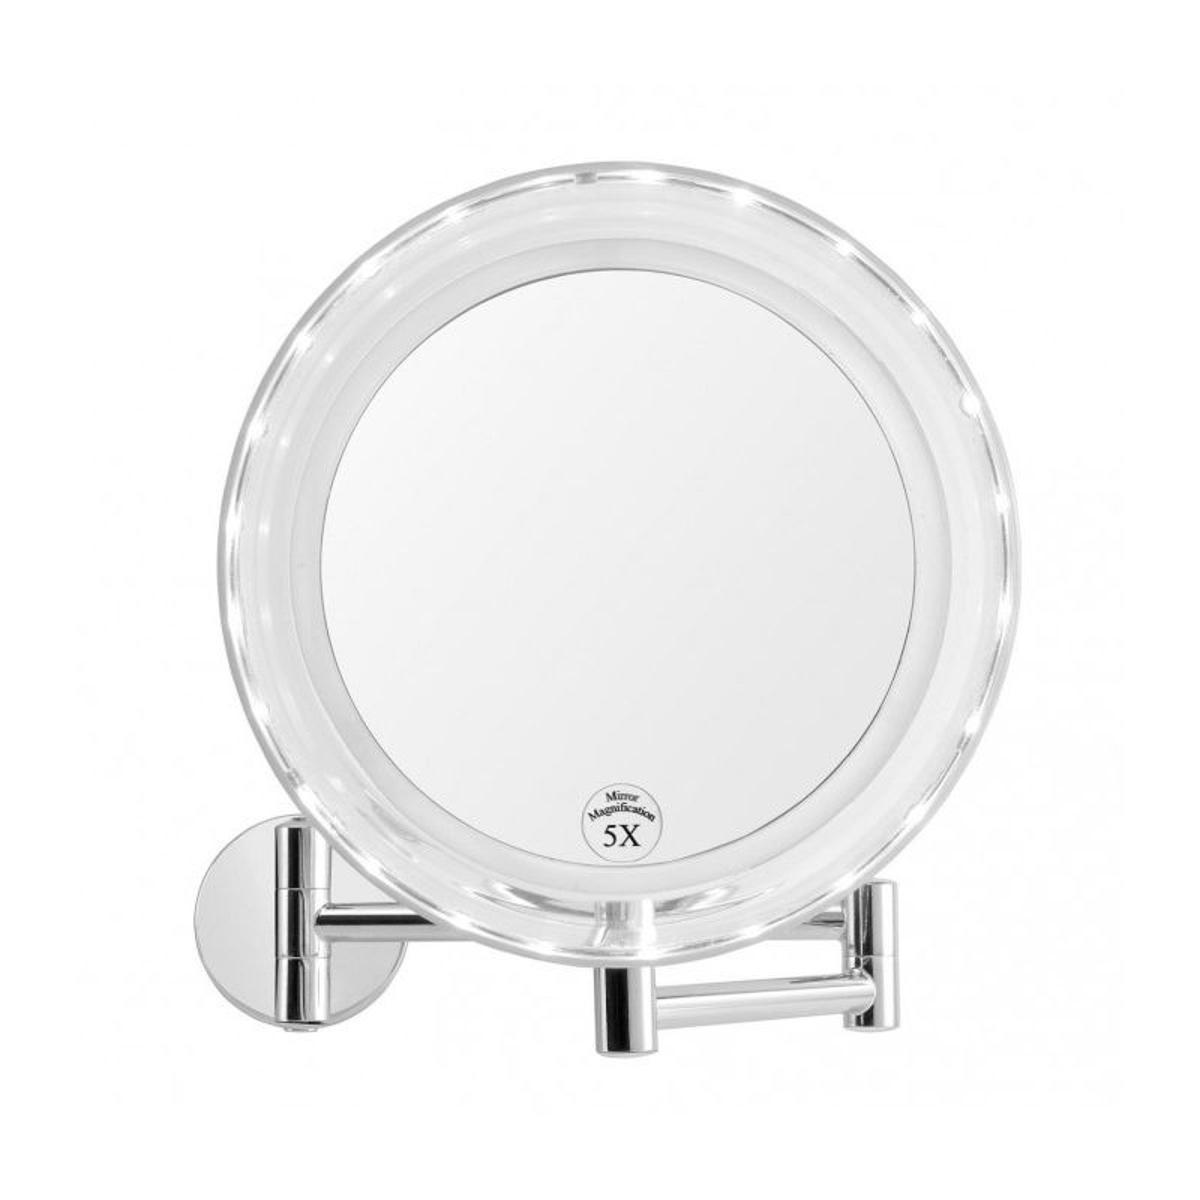 miroir grossissant lumineux sur pied miroir grossissant. Black Bedroom Furniture Sets. Home Design Ideas